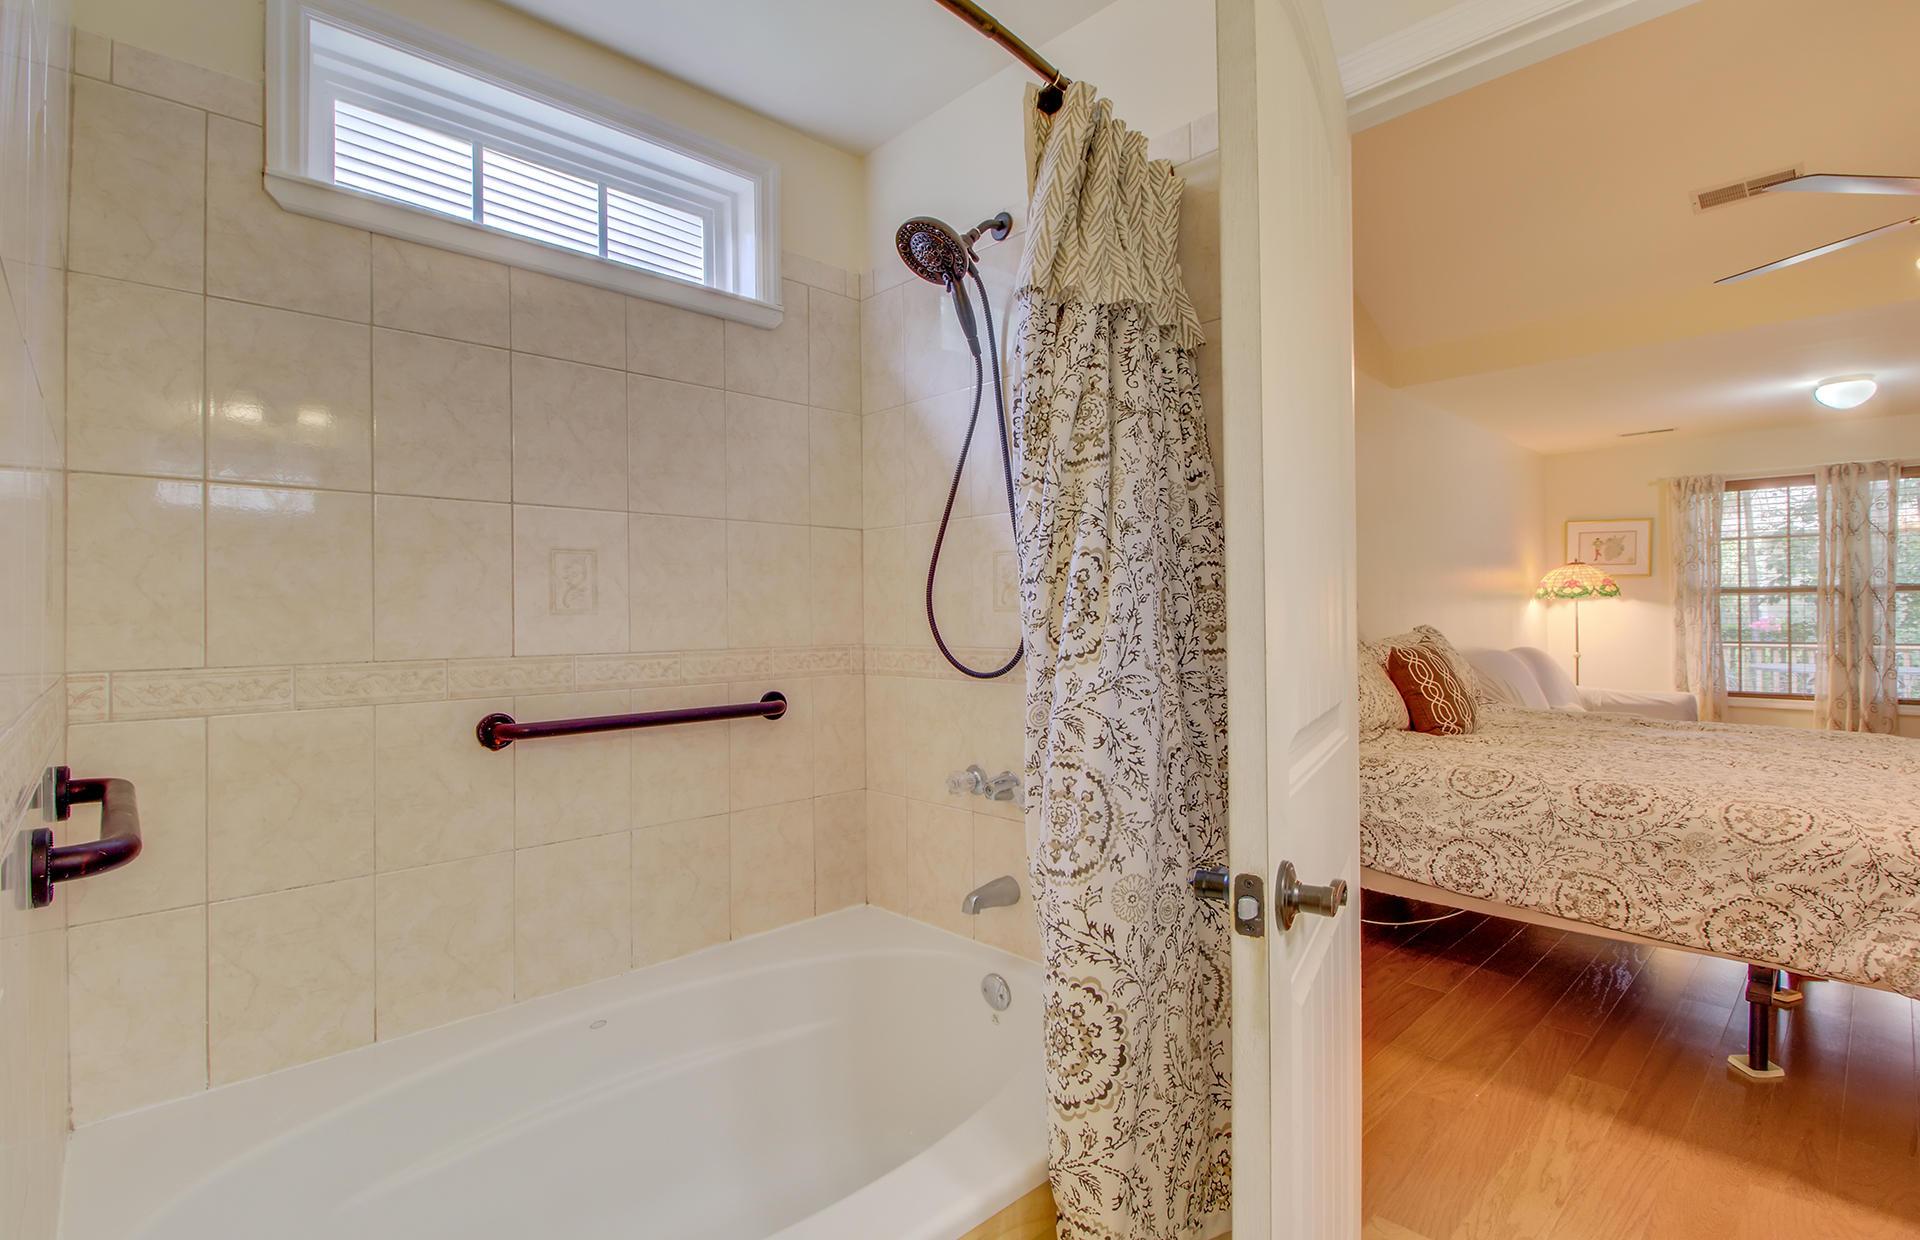 Park West Homes For Sale - 1500 Wellesley, Mount Pleasant, SC - 3